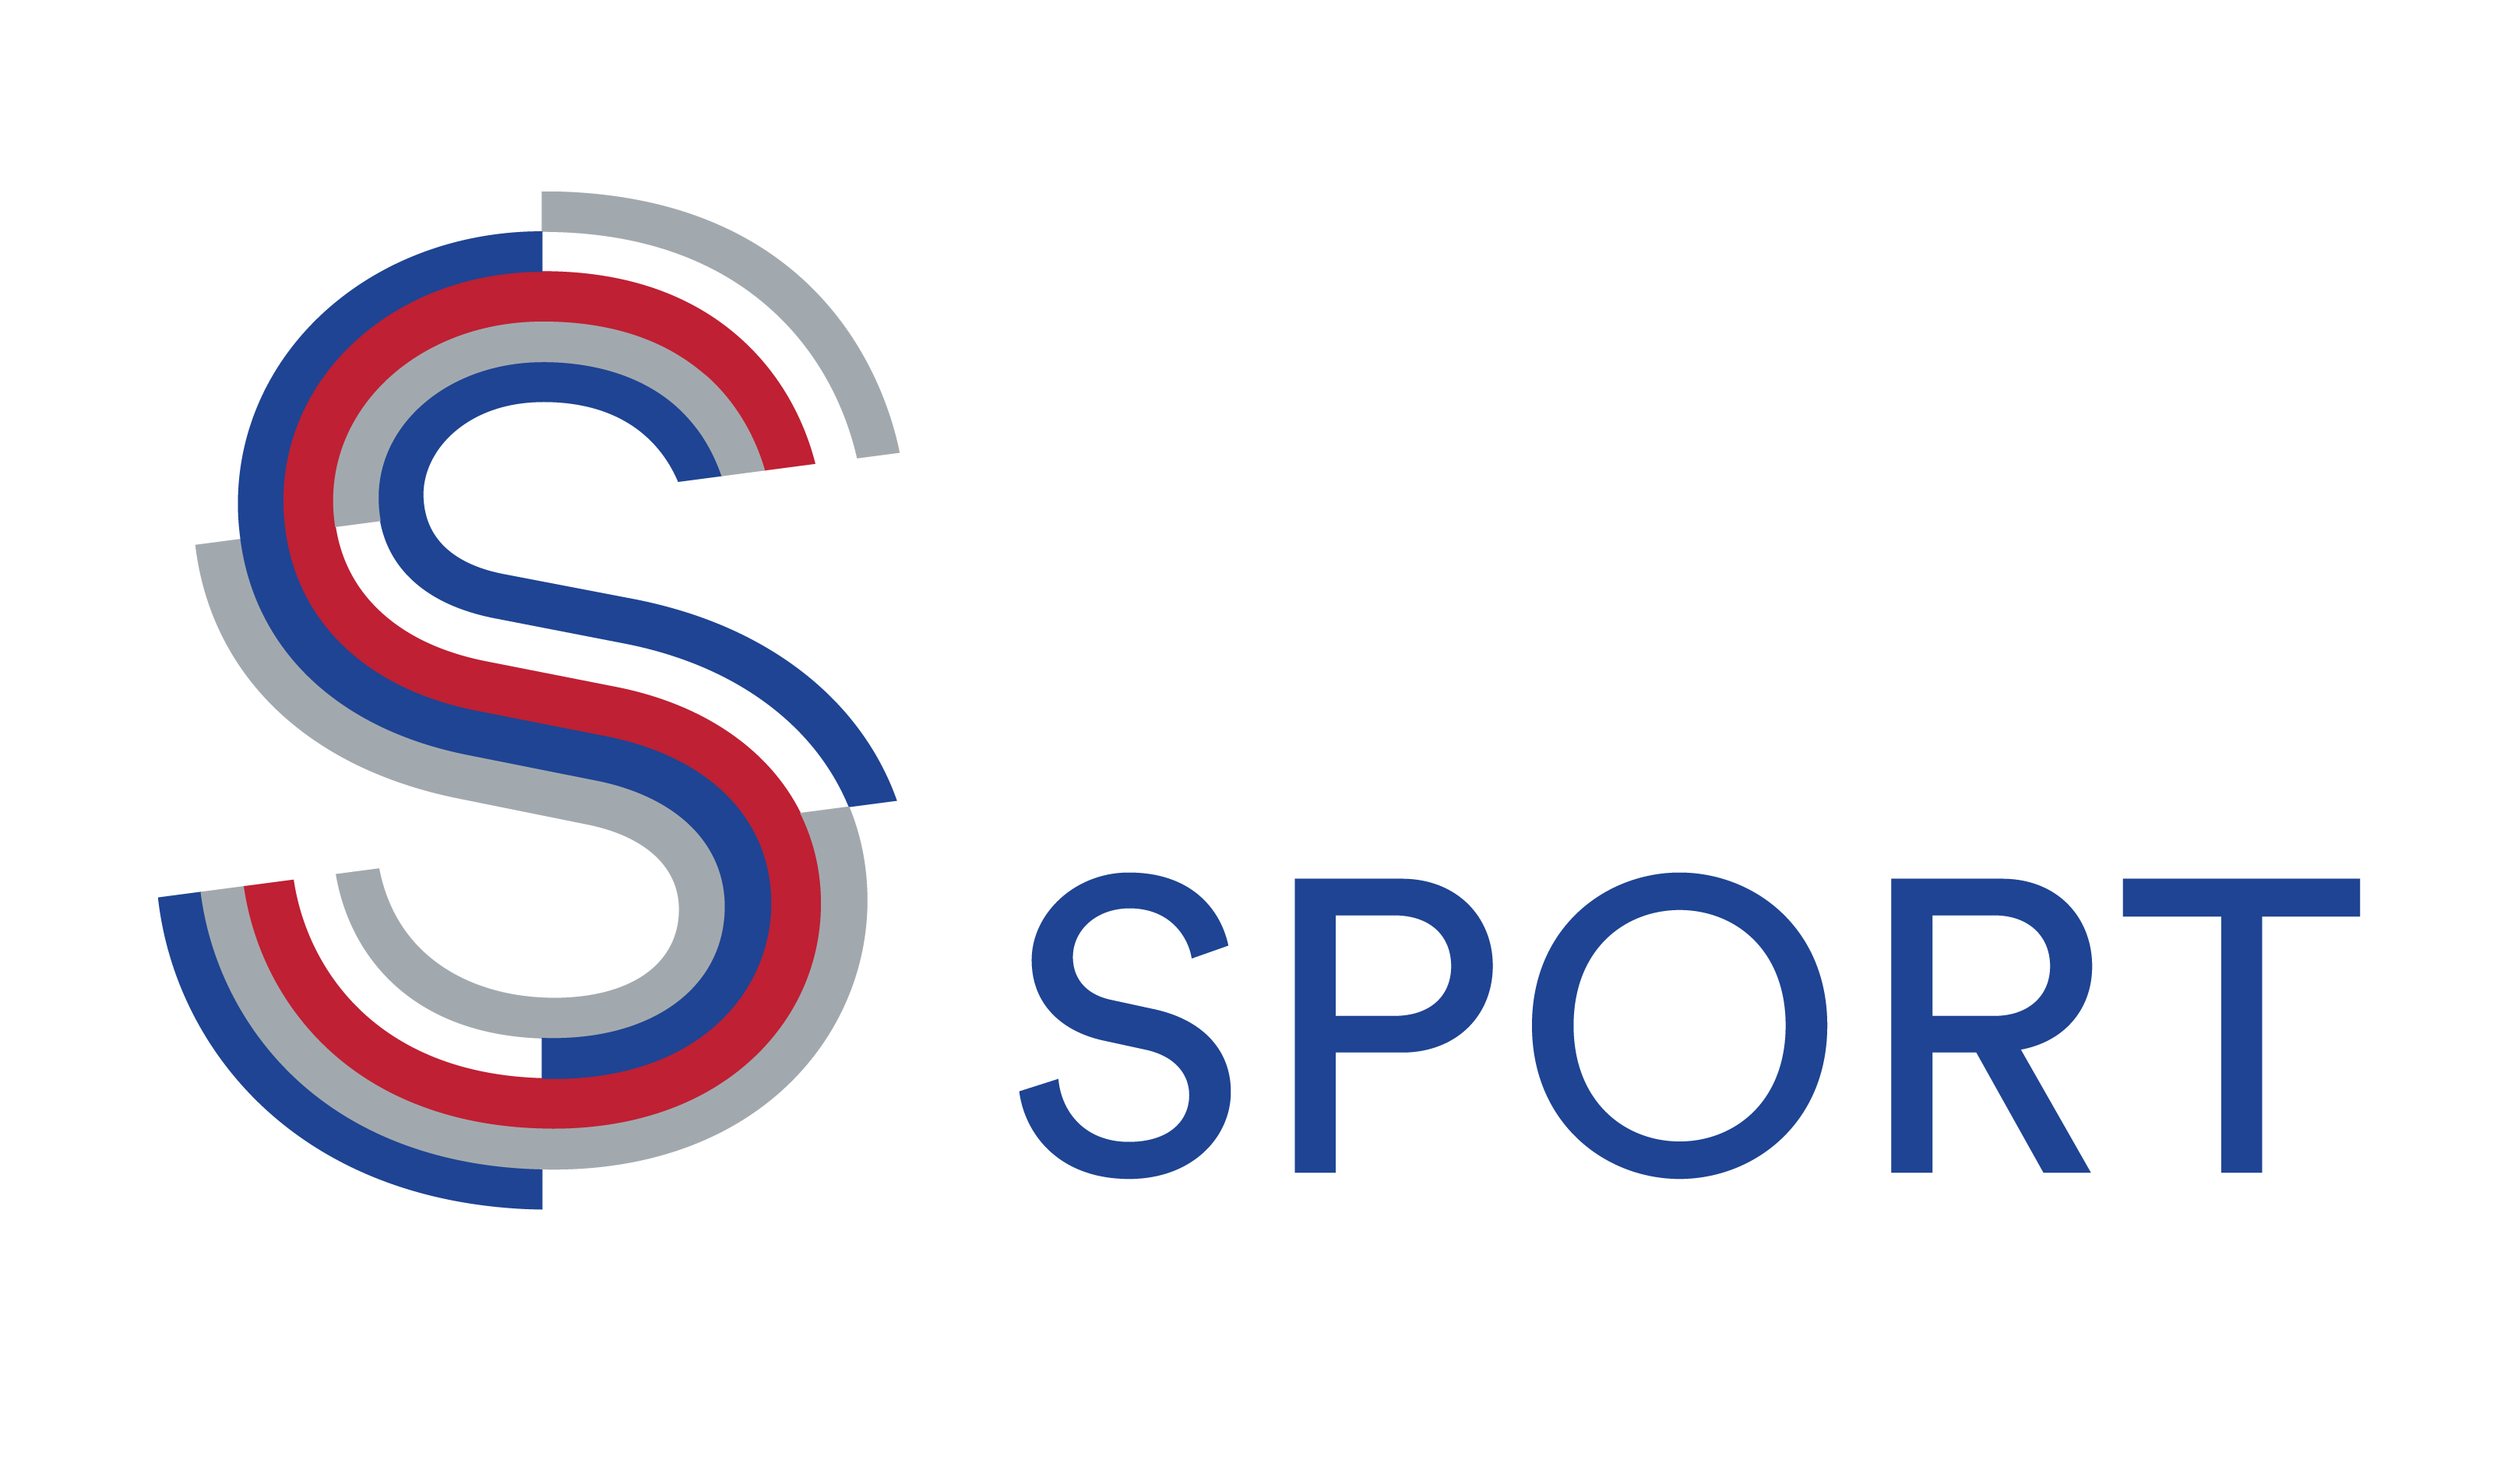 Grand Prix 2. Hafta Maçları S Sport'ta!